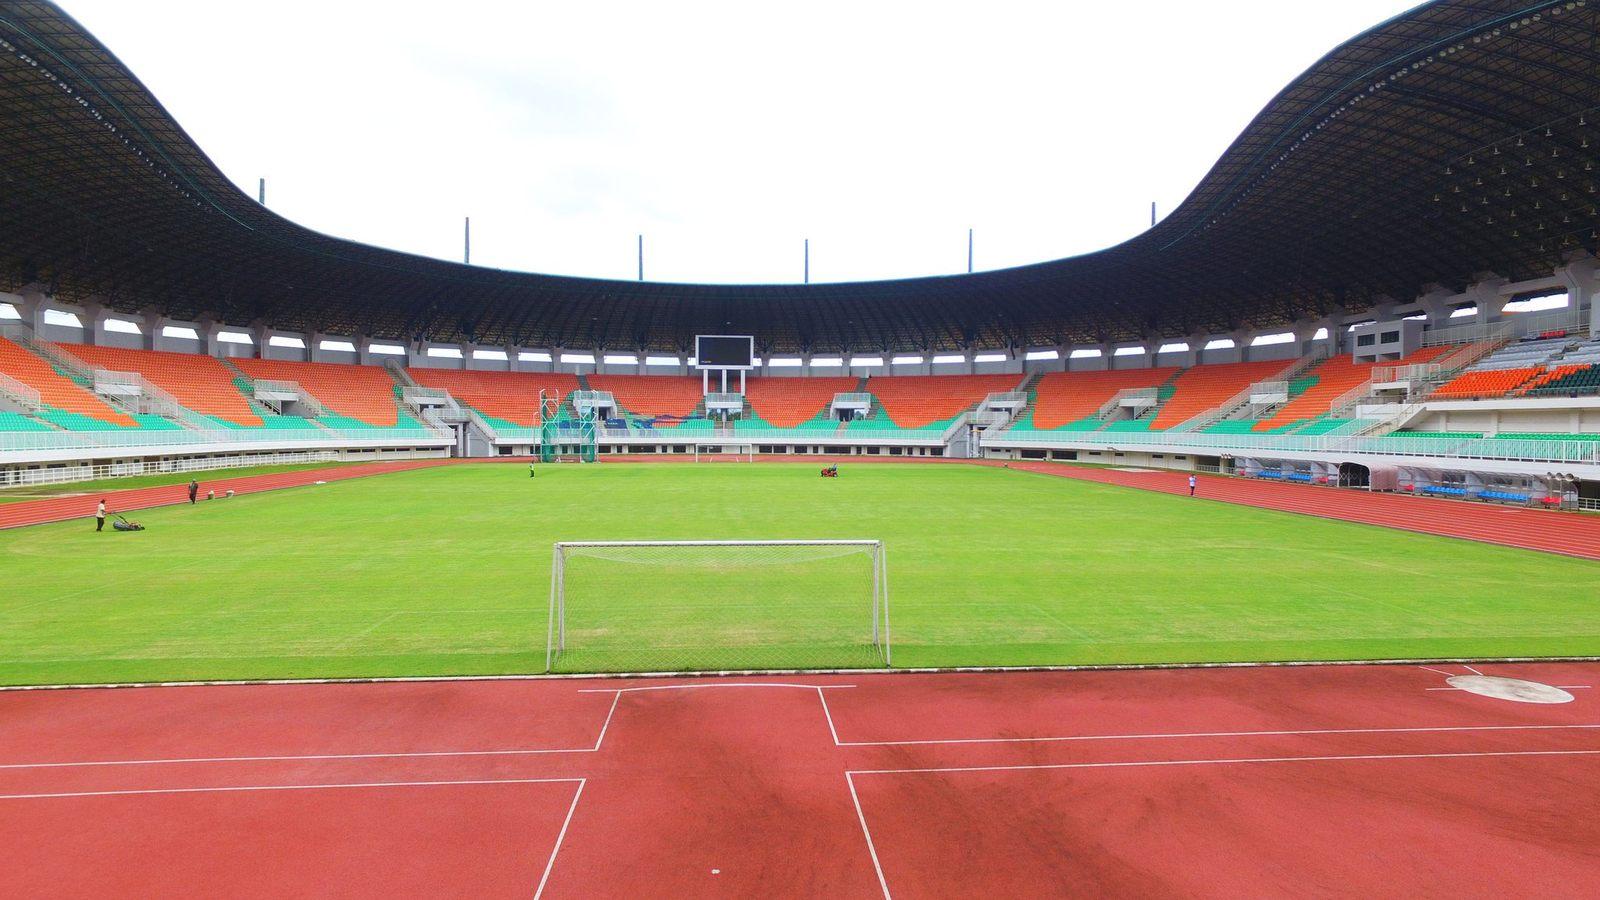 Arena Stadion